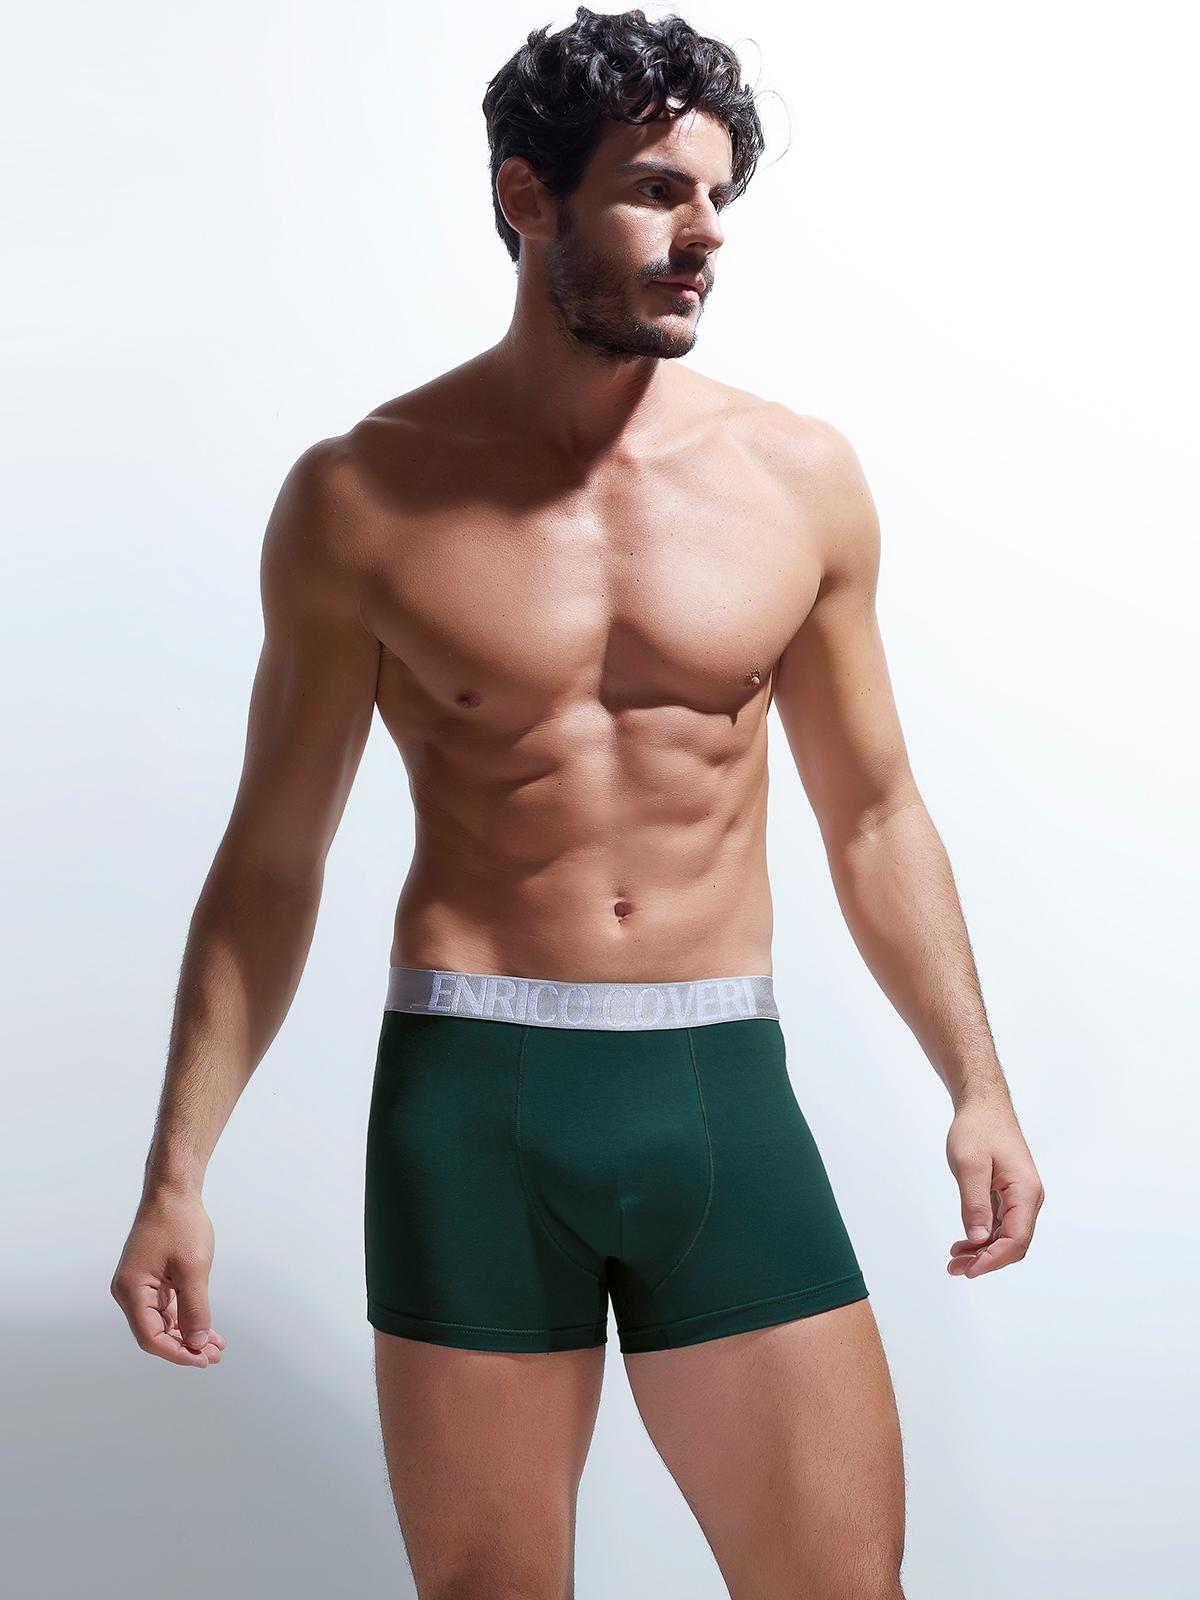 Трусы боксеры мужские Enrico Coveri зеленые XL